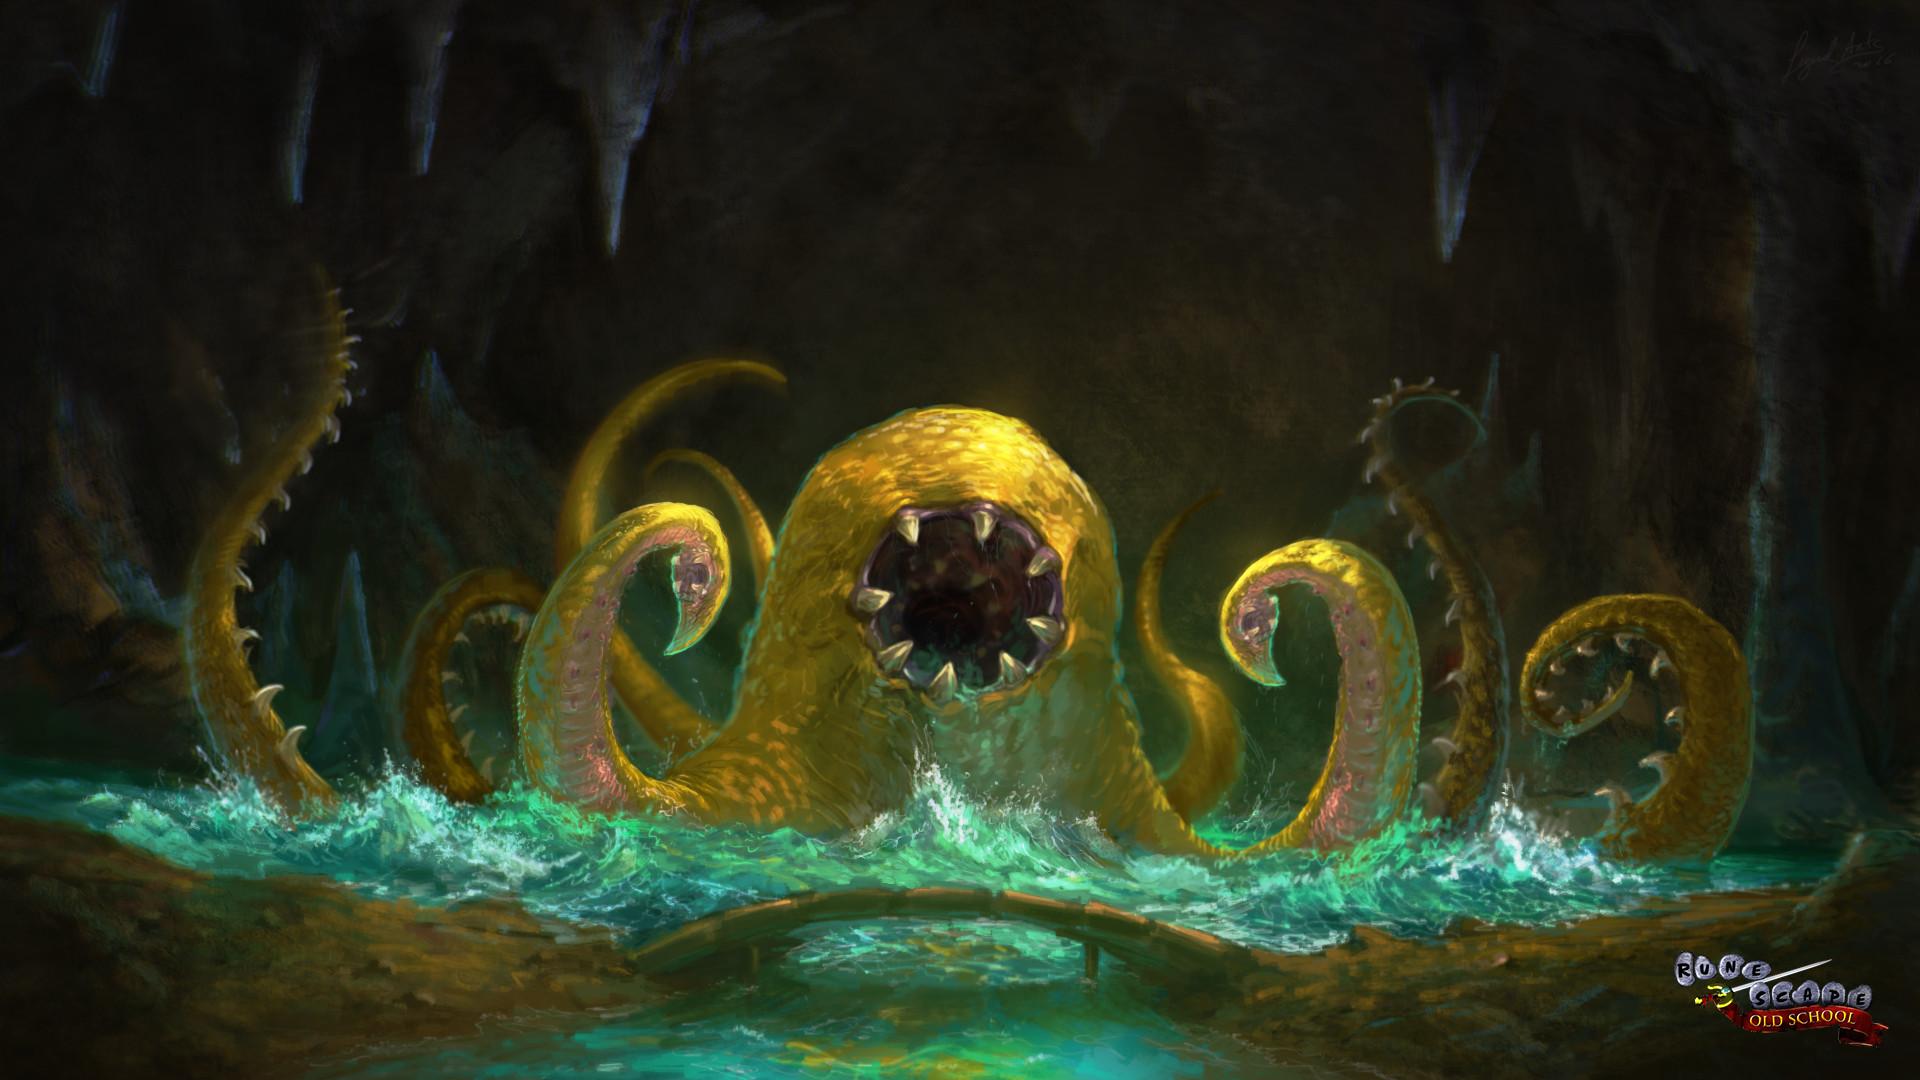 Kraken by RS-LegendArts Kraken by RS-LegendArts